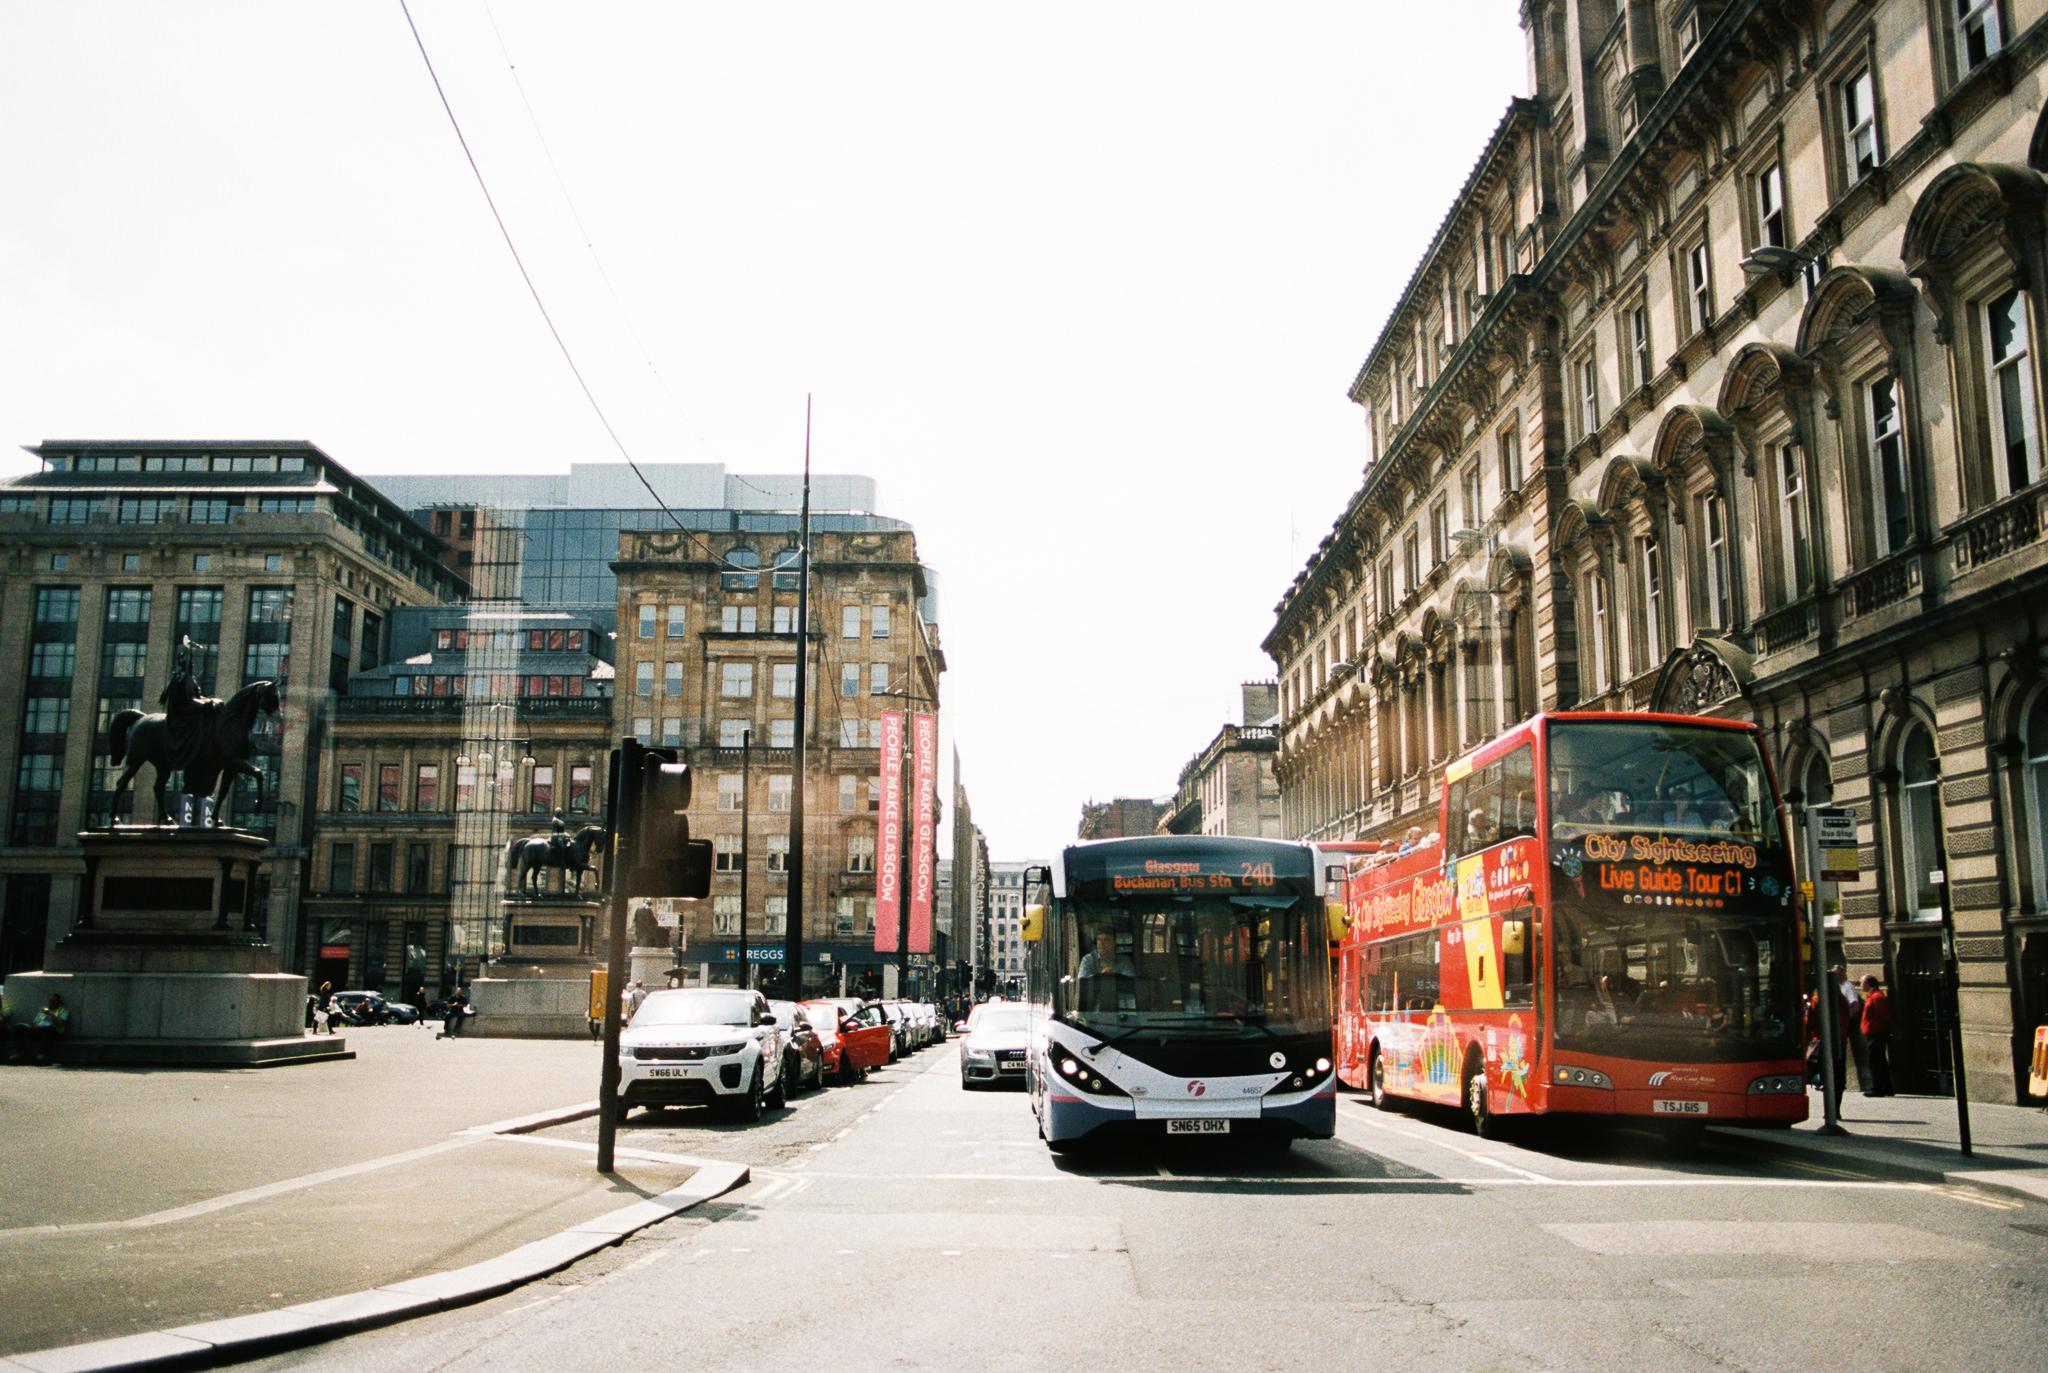 Scotland_Glasgow+Edinburgh-7.jpg